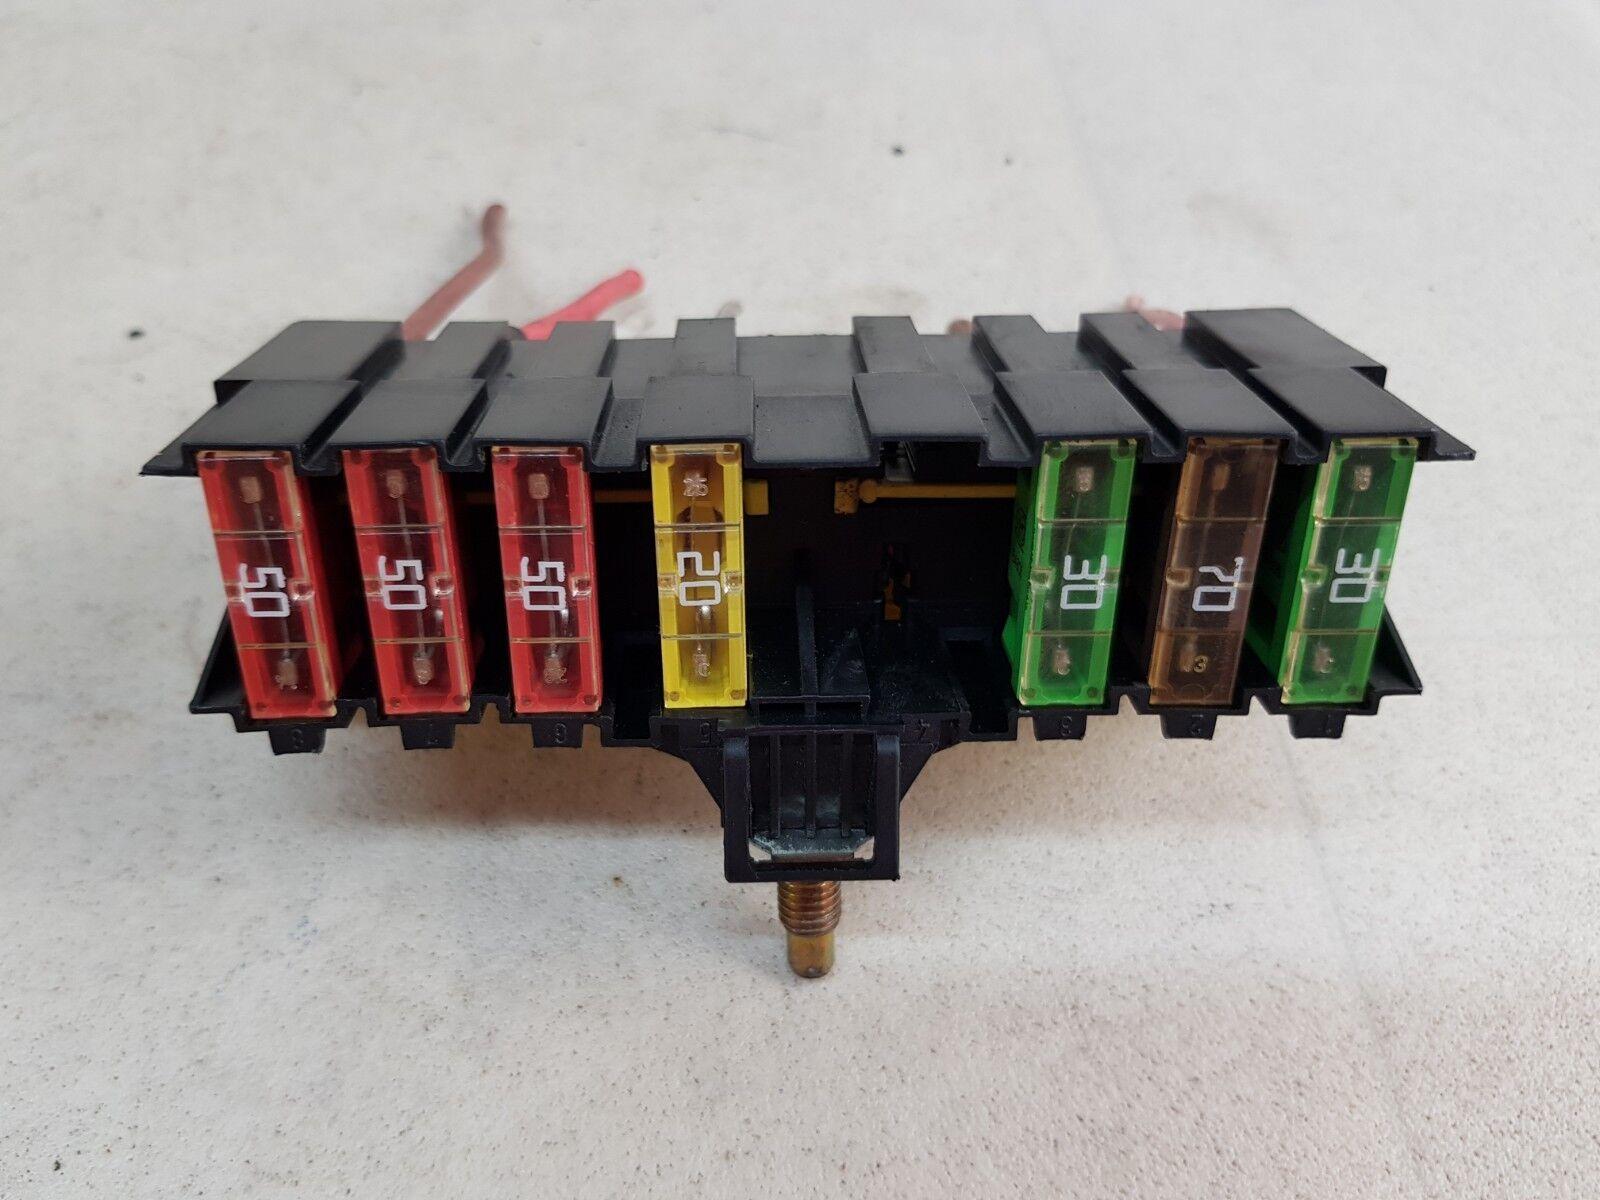 details about citroen c4 picasso mk1 07 13 engine fuse box relay control module 9636079380 [ 1600 x 1200 Pixel ]